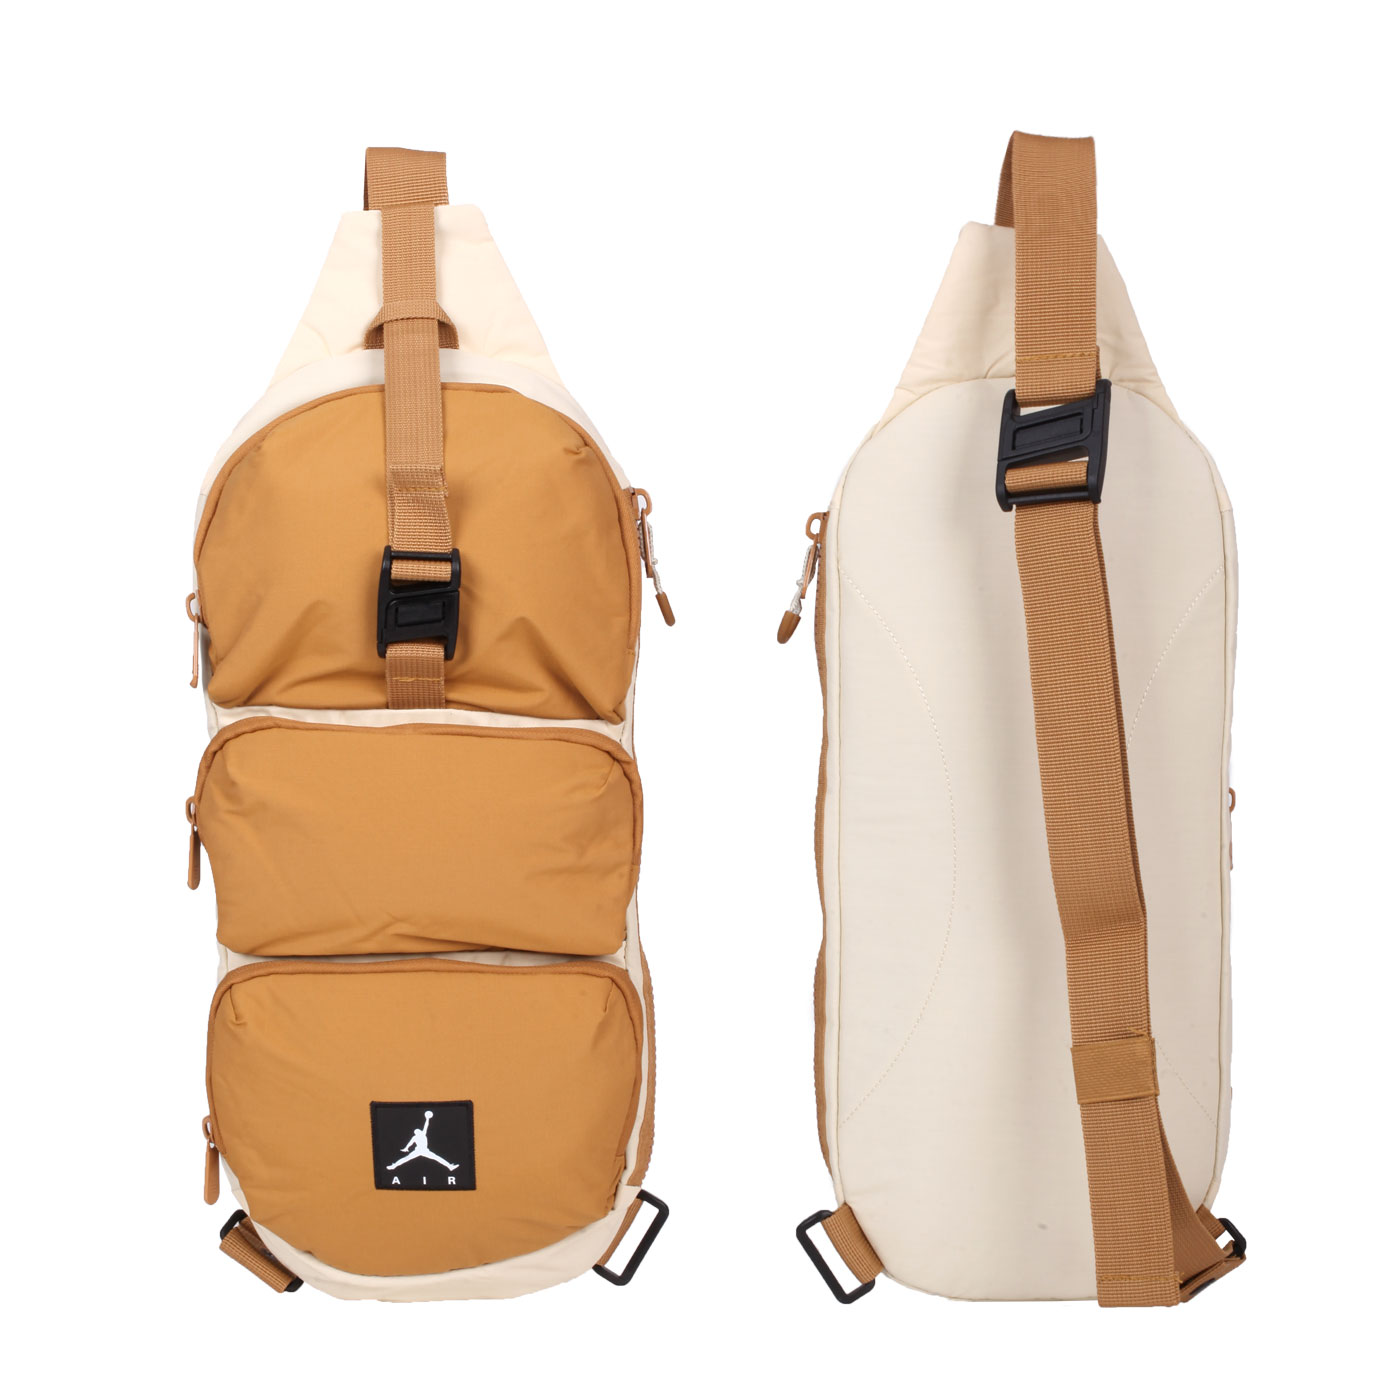 NIKE JORDAN 大型腰包 JD2113014AD-002 - 米白黃棕